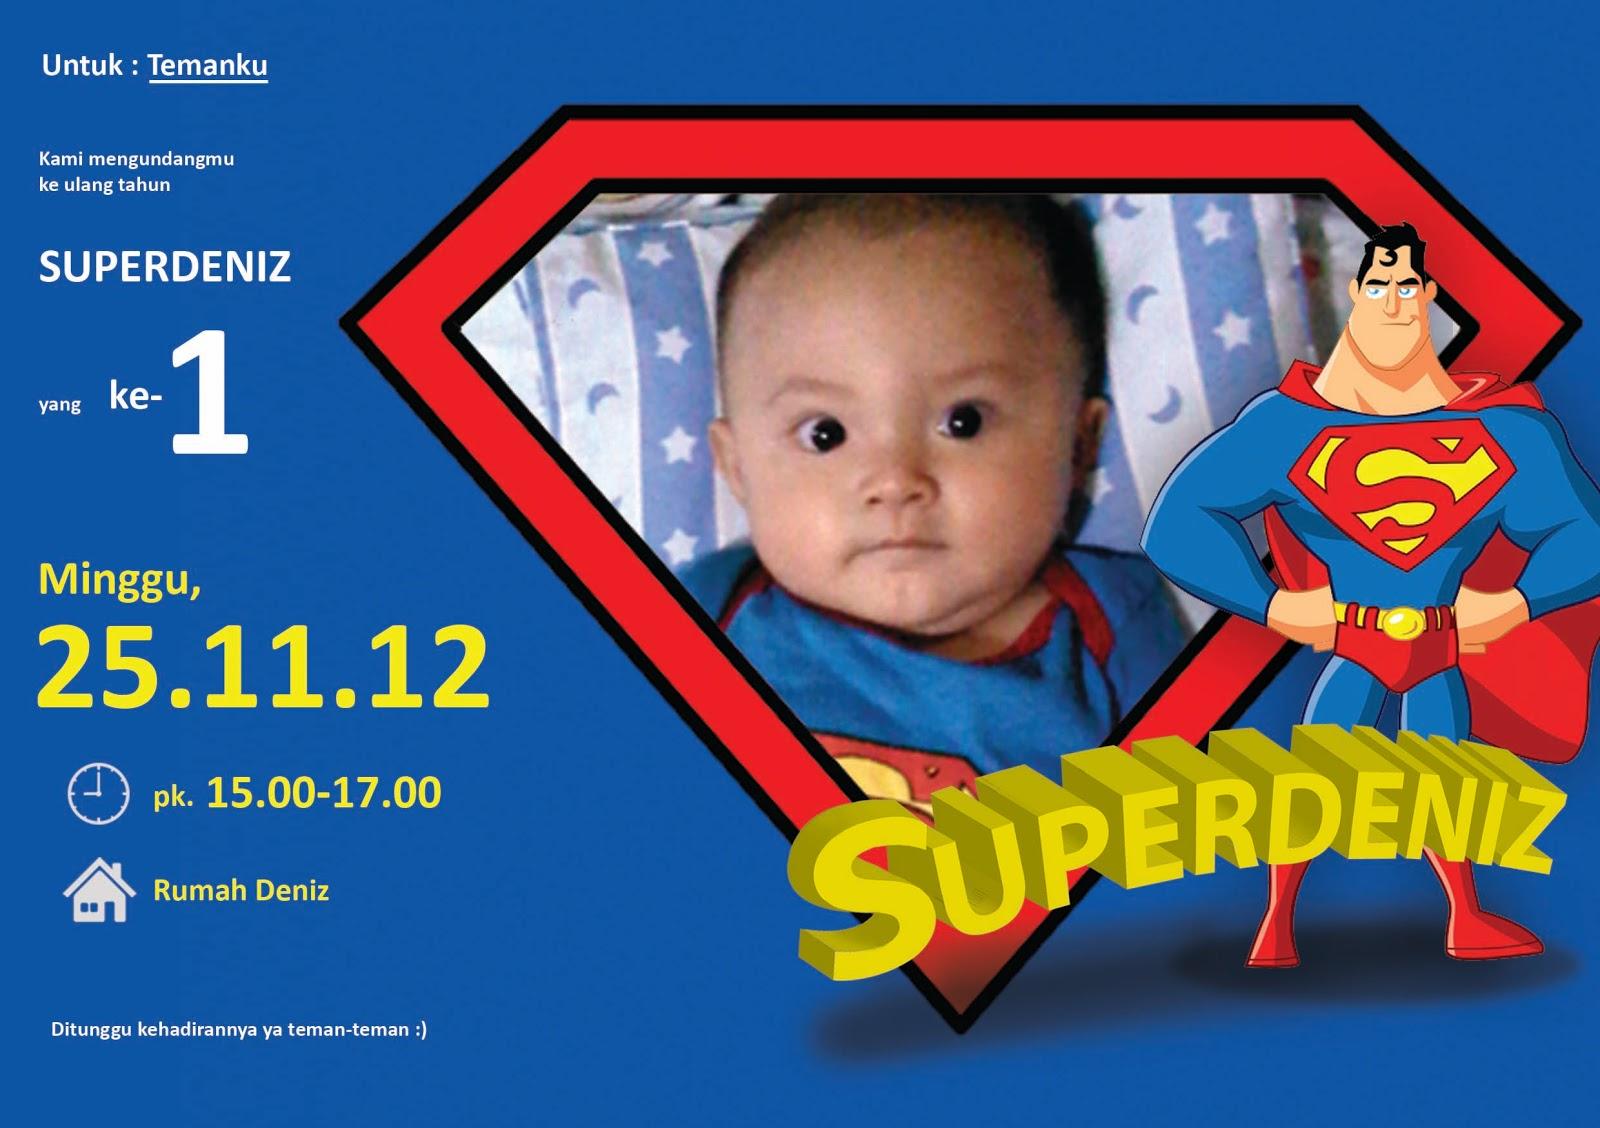 Superdeniz Invitation